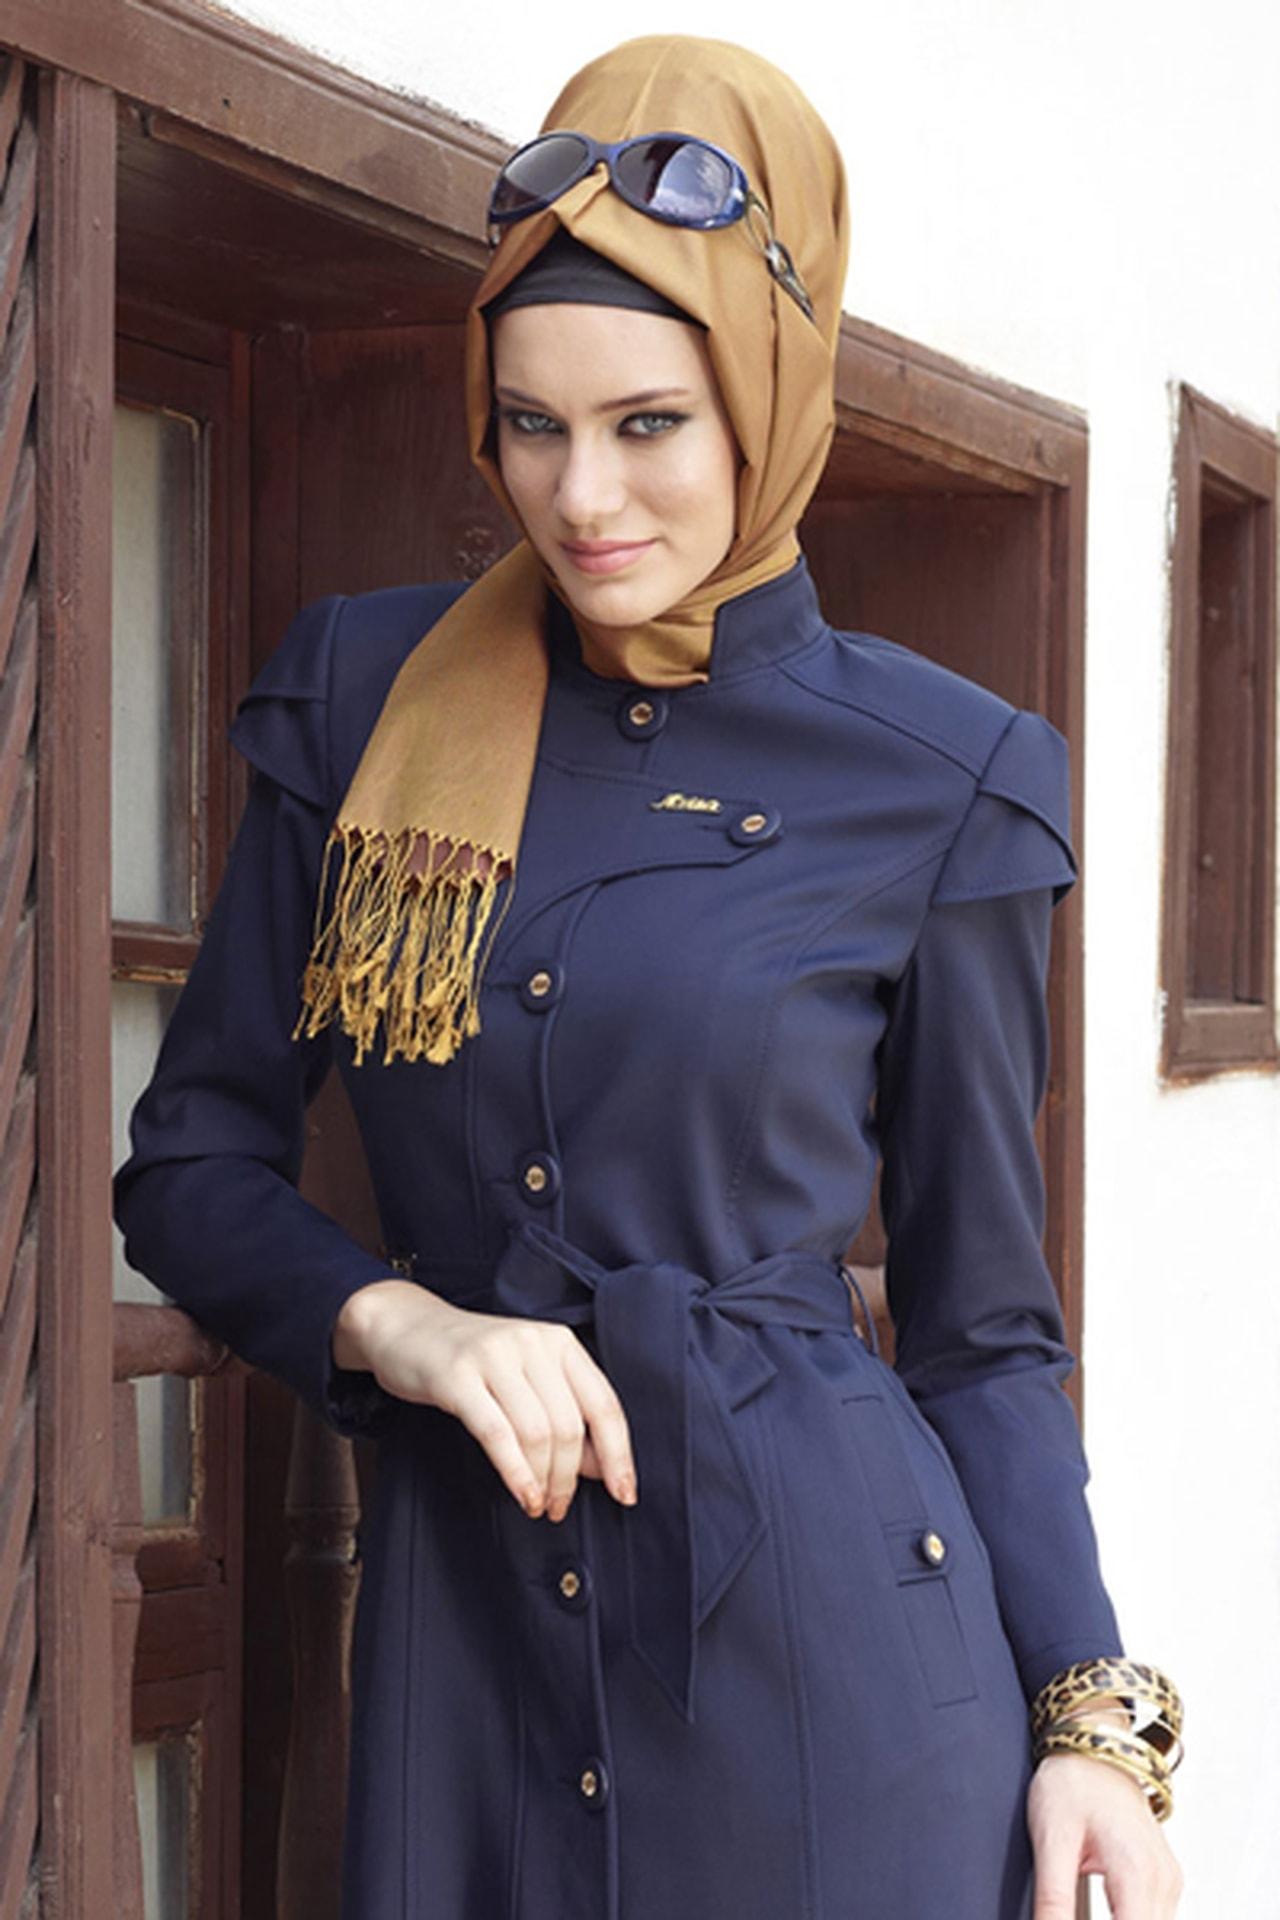 بالصور موديلات حجابات تركية , اجمل صور للحجاب التركي 2628 10